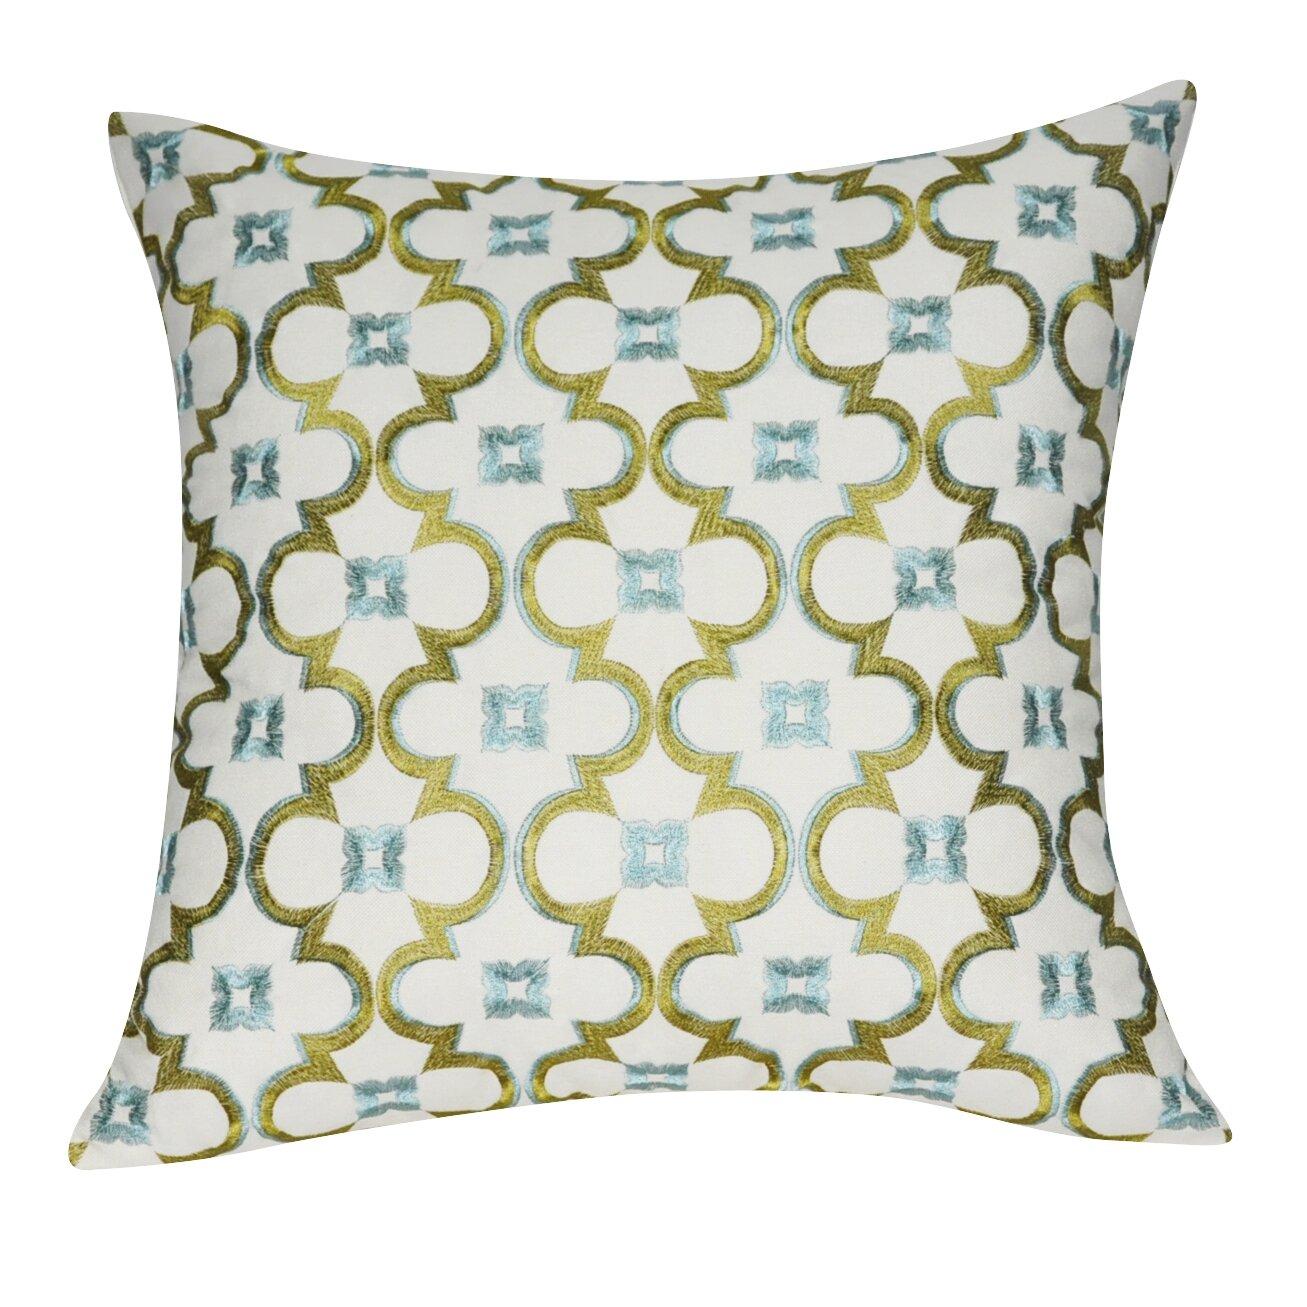 Loom and Mill Damask Decorative Throw Pillow & Reviews Wayfair